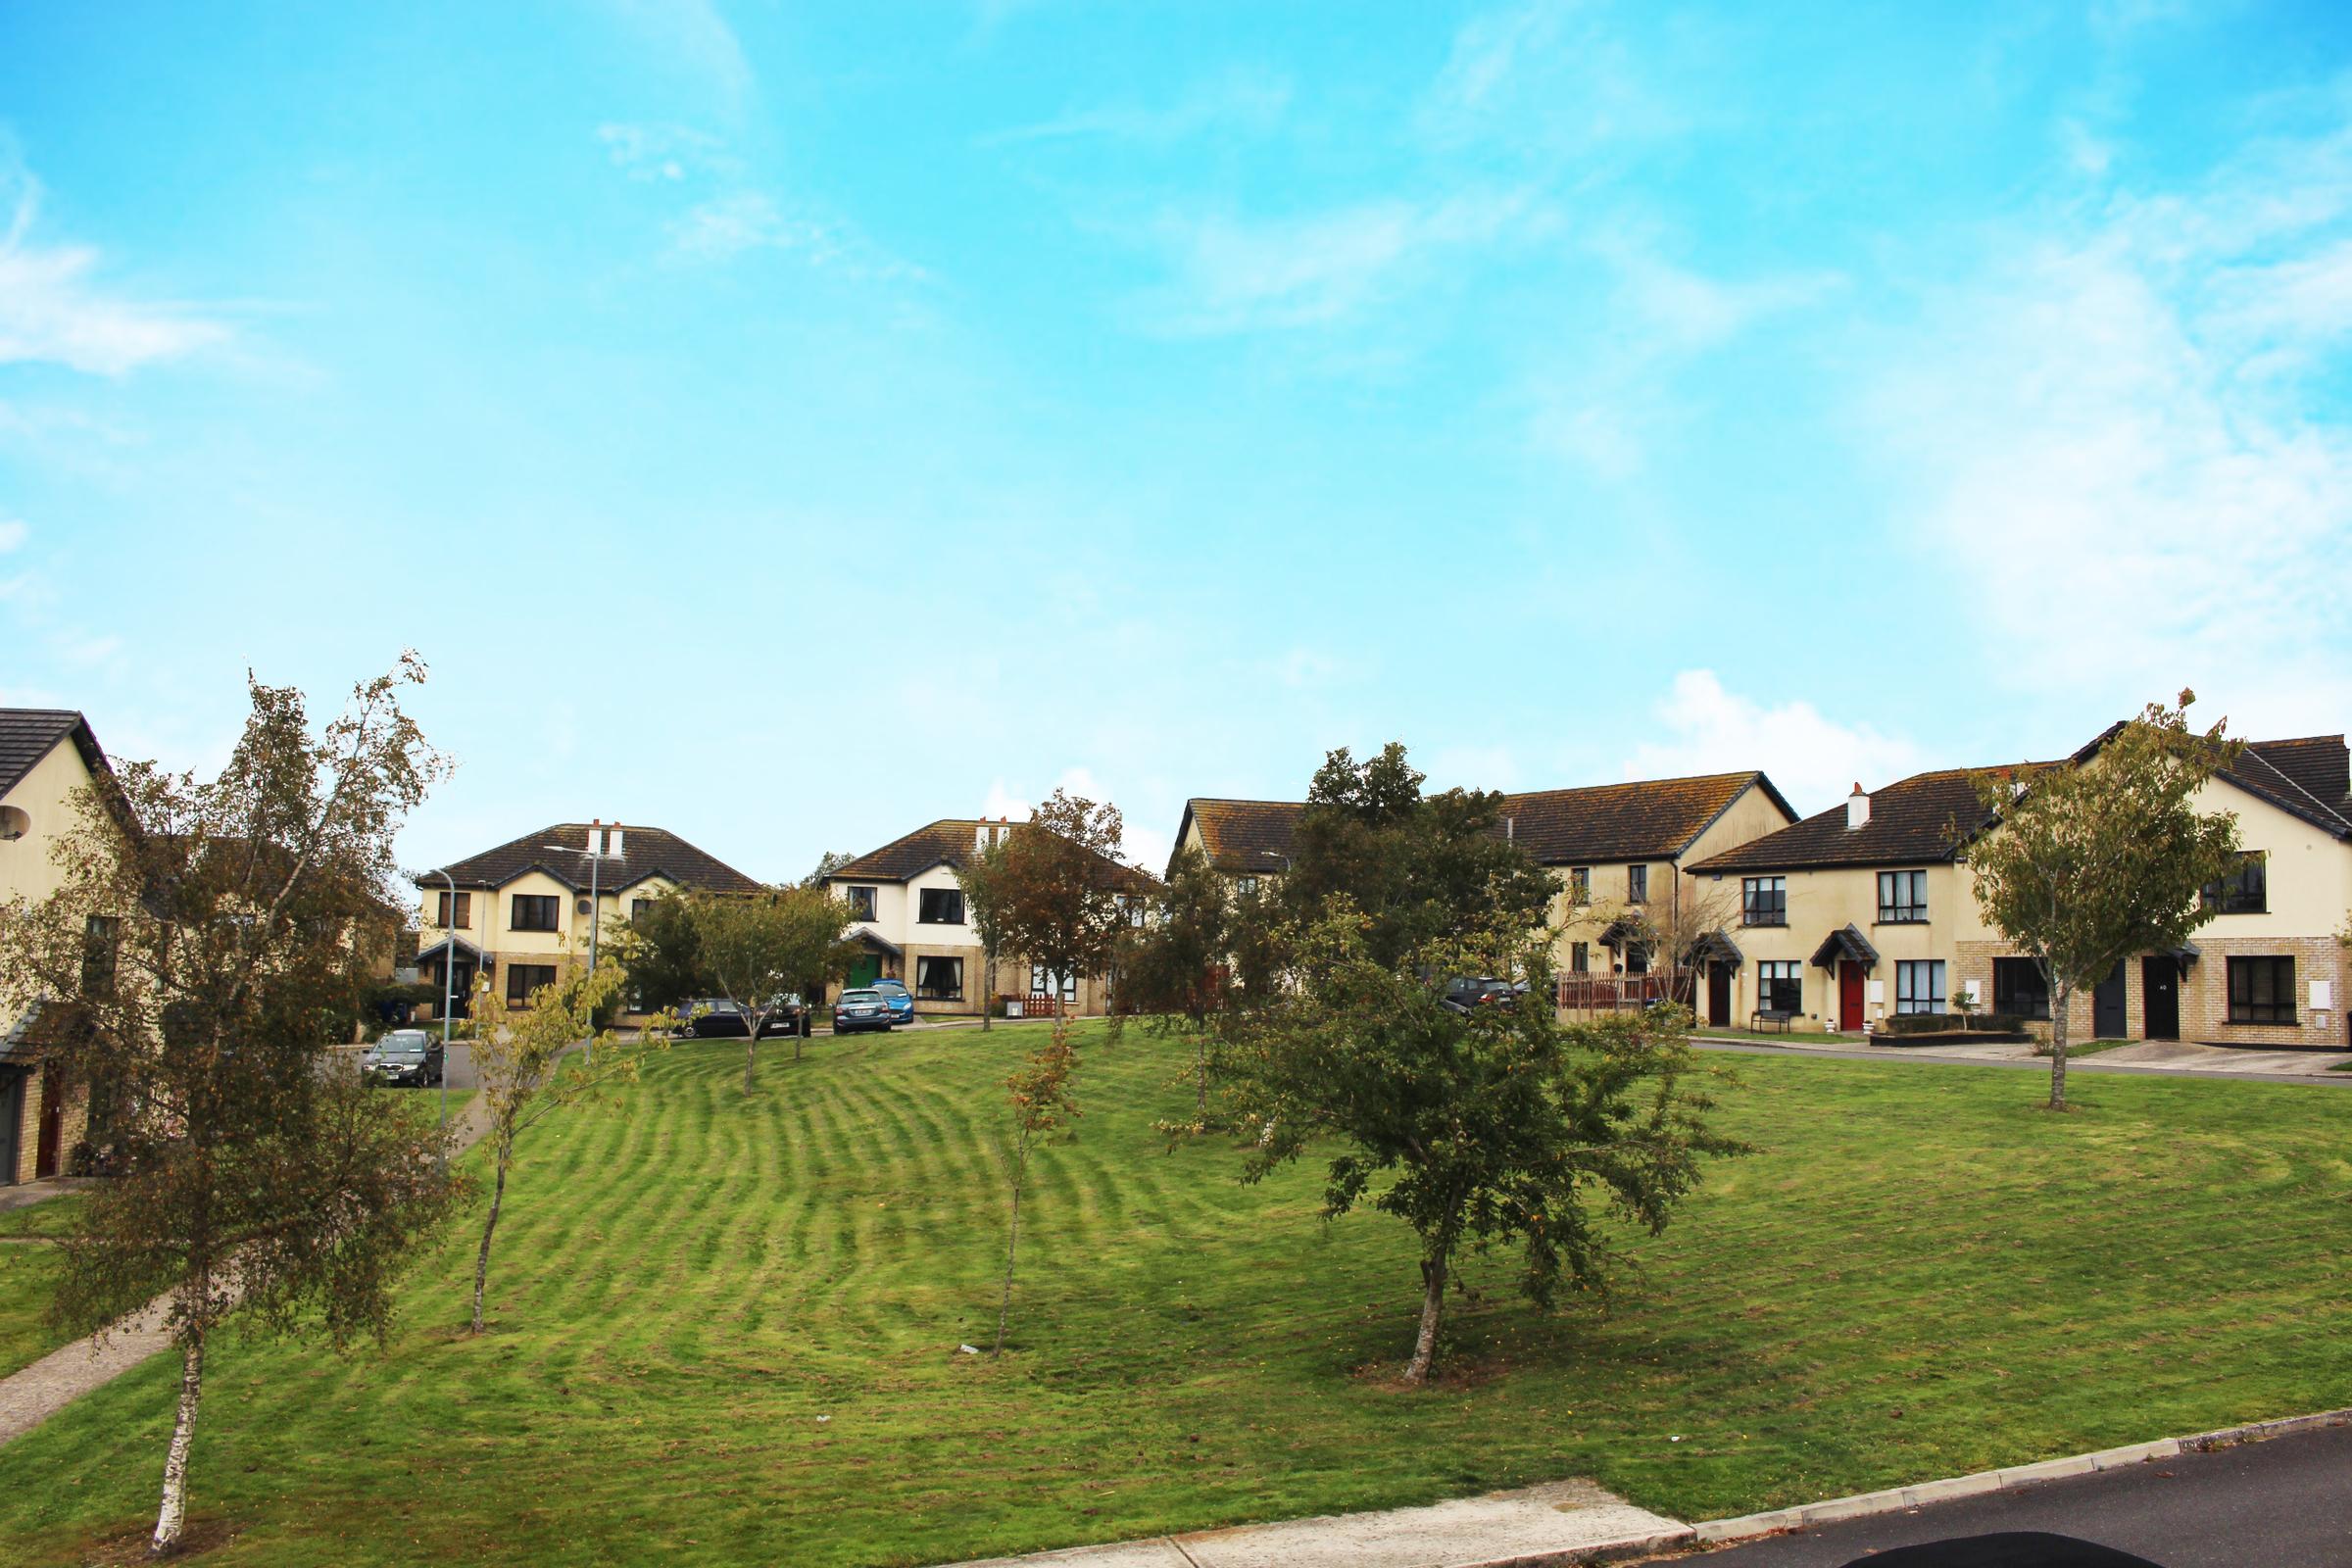 8 Chestnut Walk, Kilmuckridge, Co. Wexford